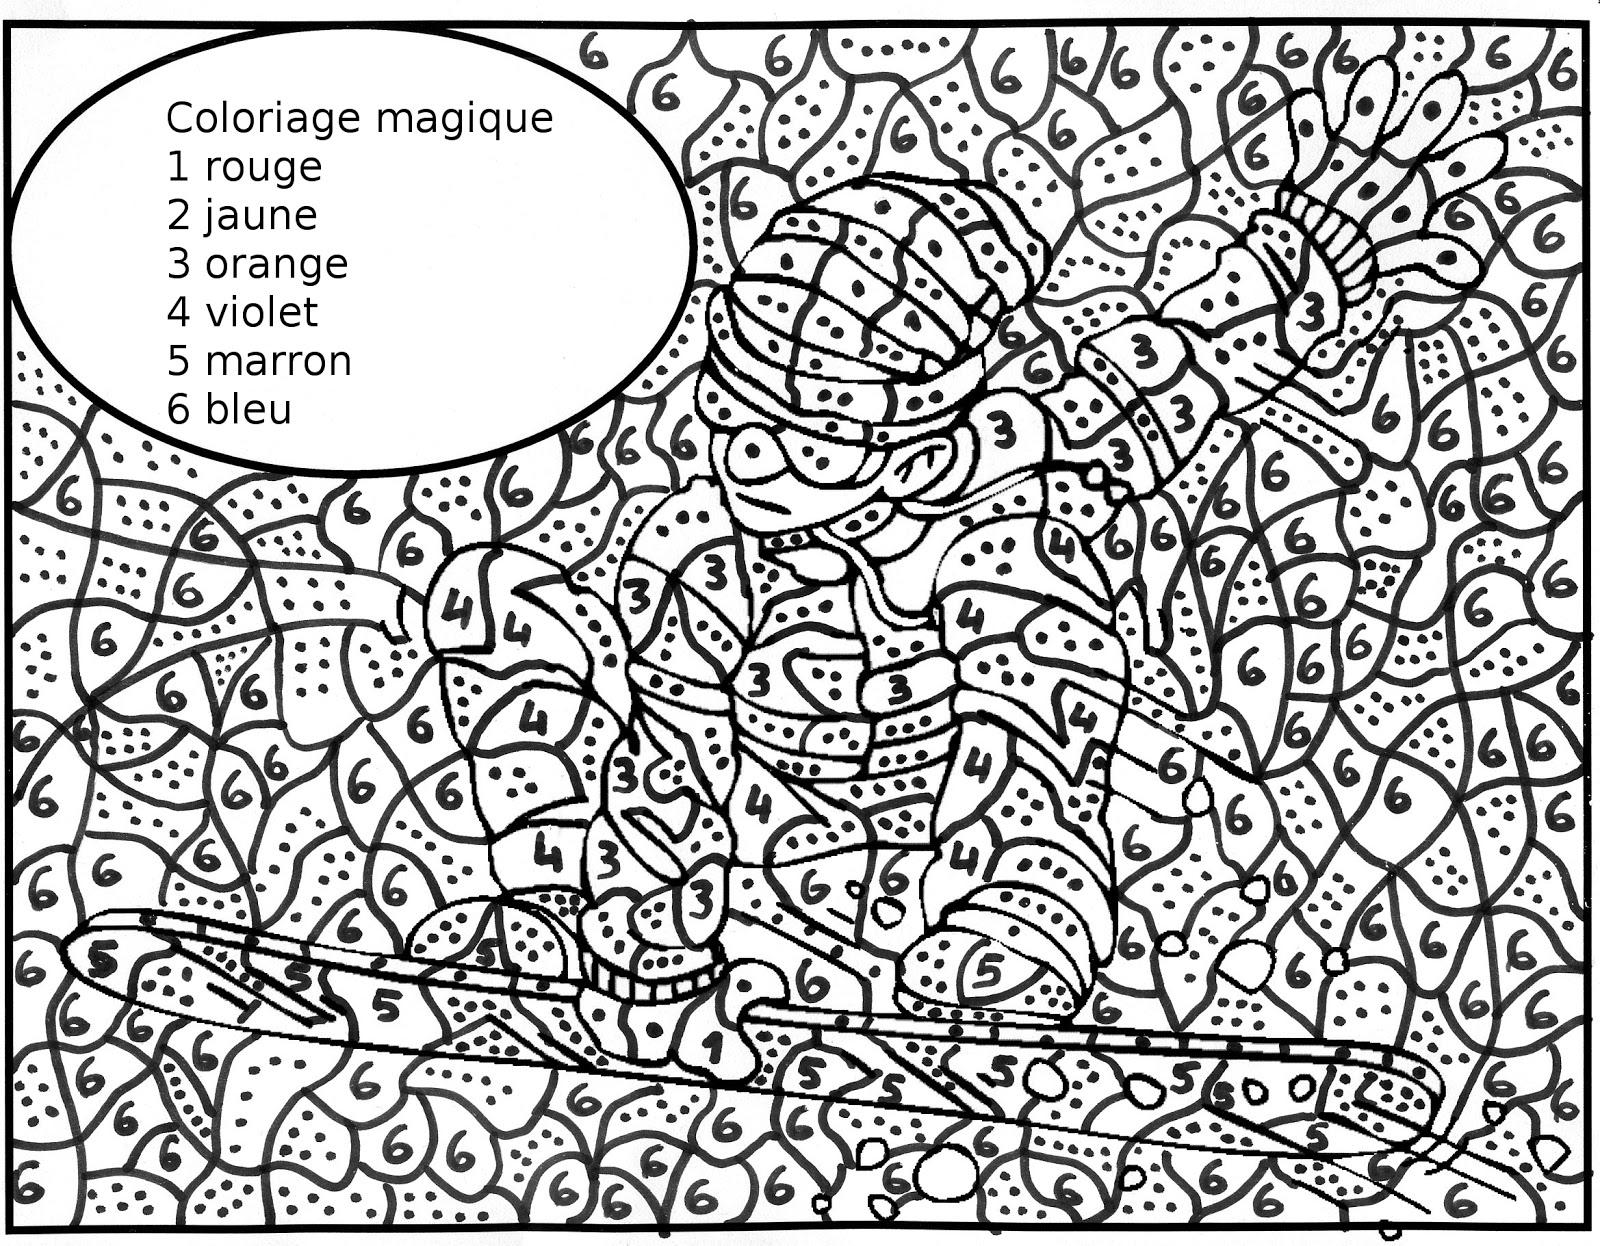 Coloriage Magique Cm2 Pdf.Coloriage Anti Stress Numerote A Imprimer